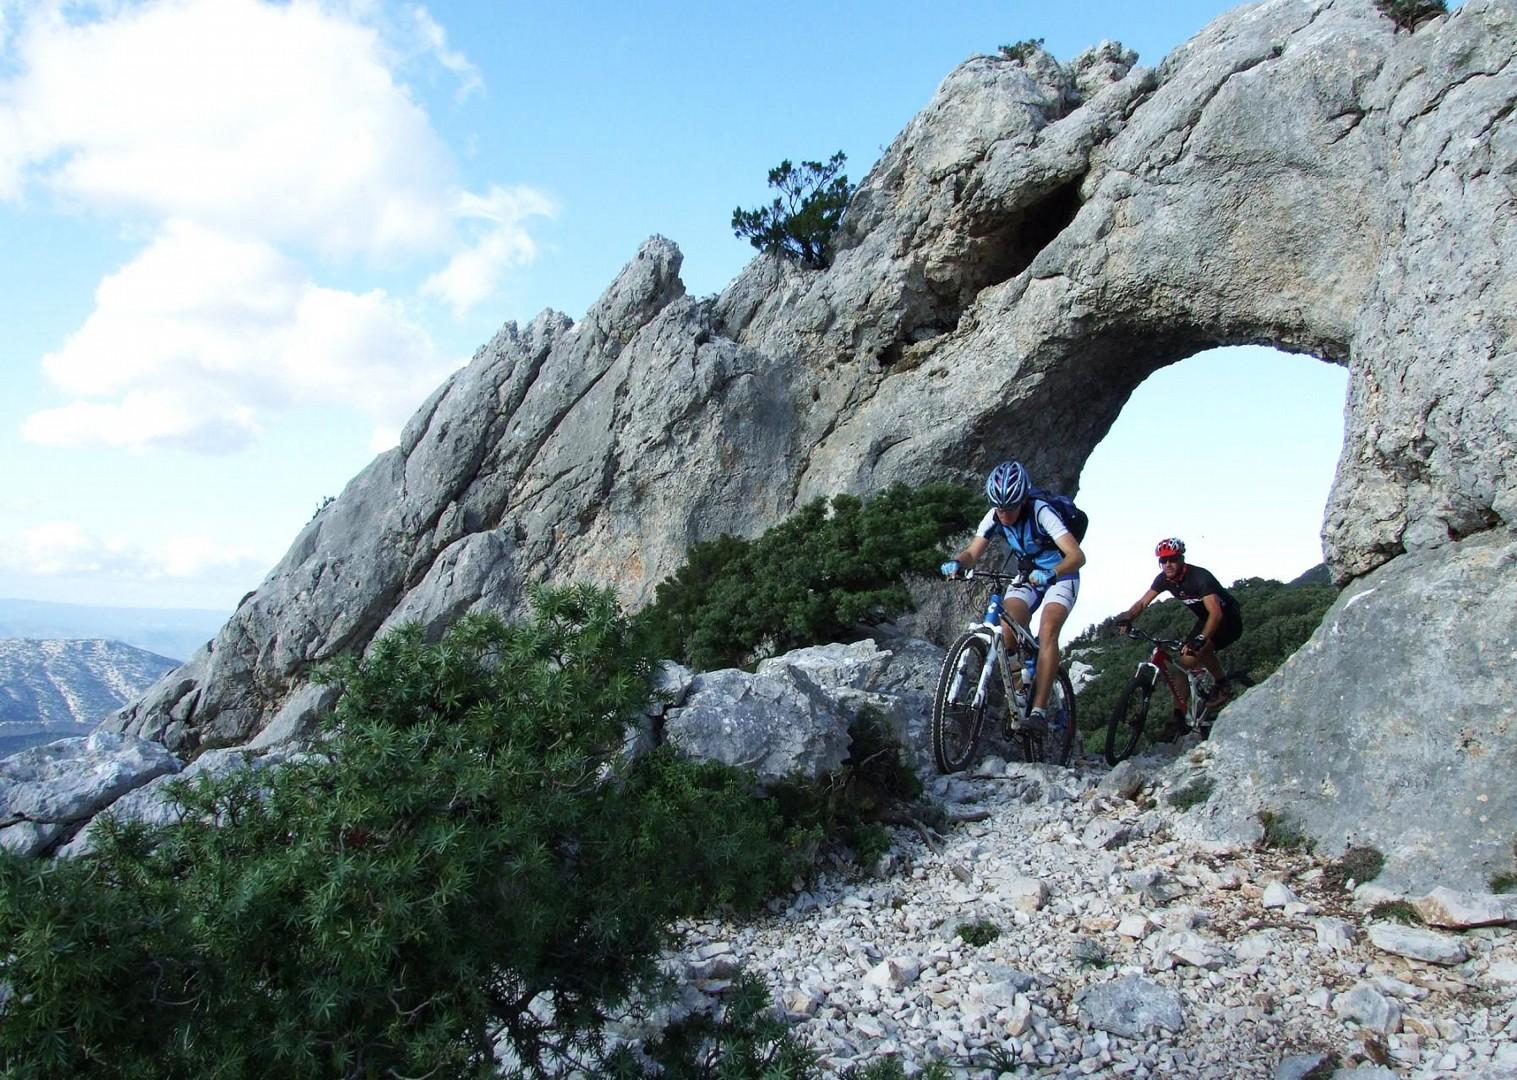 mountain-biking-holiday-in-italy-sardinia.jpg - Sardinia - Coast to Coast - Mountain Biking